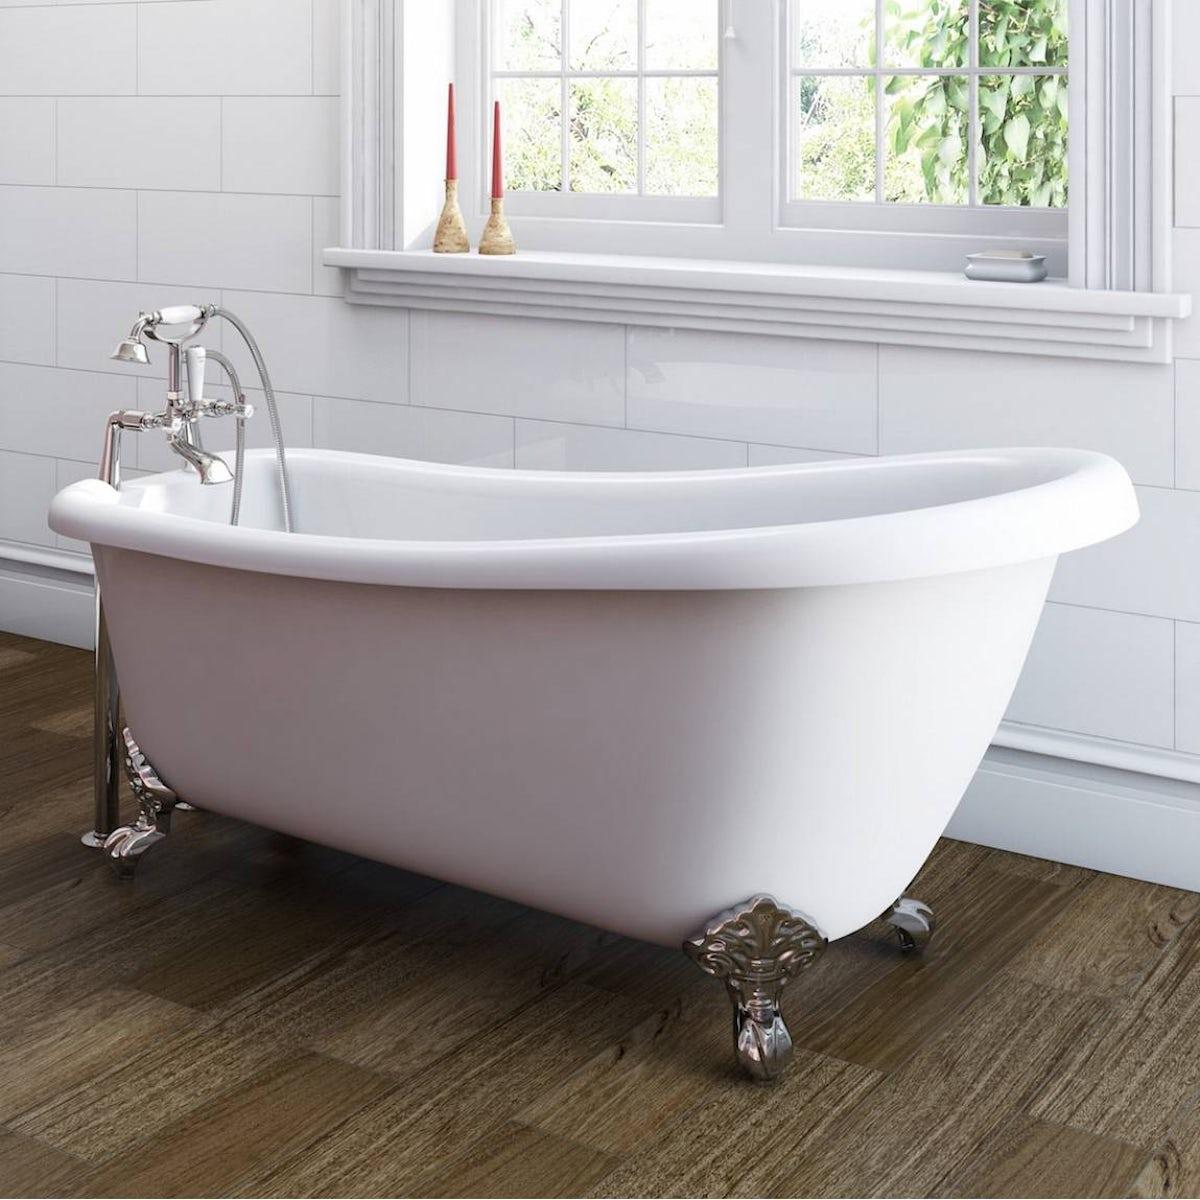 Deco bathroom suite with slipper bath small for Small baths 1200